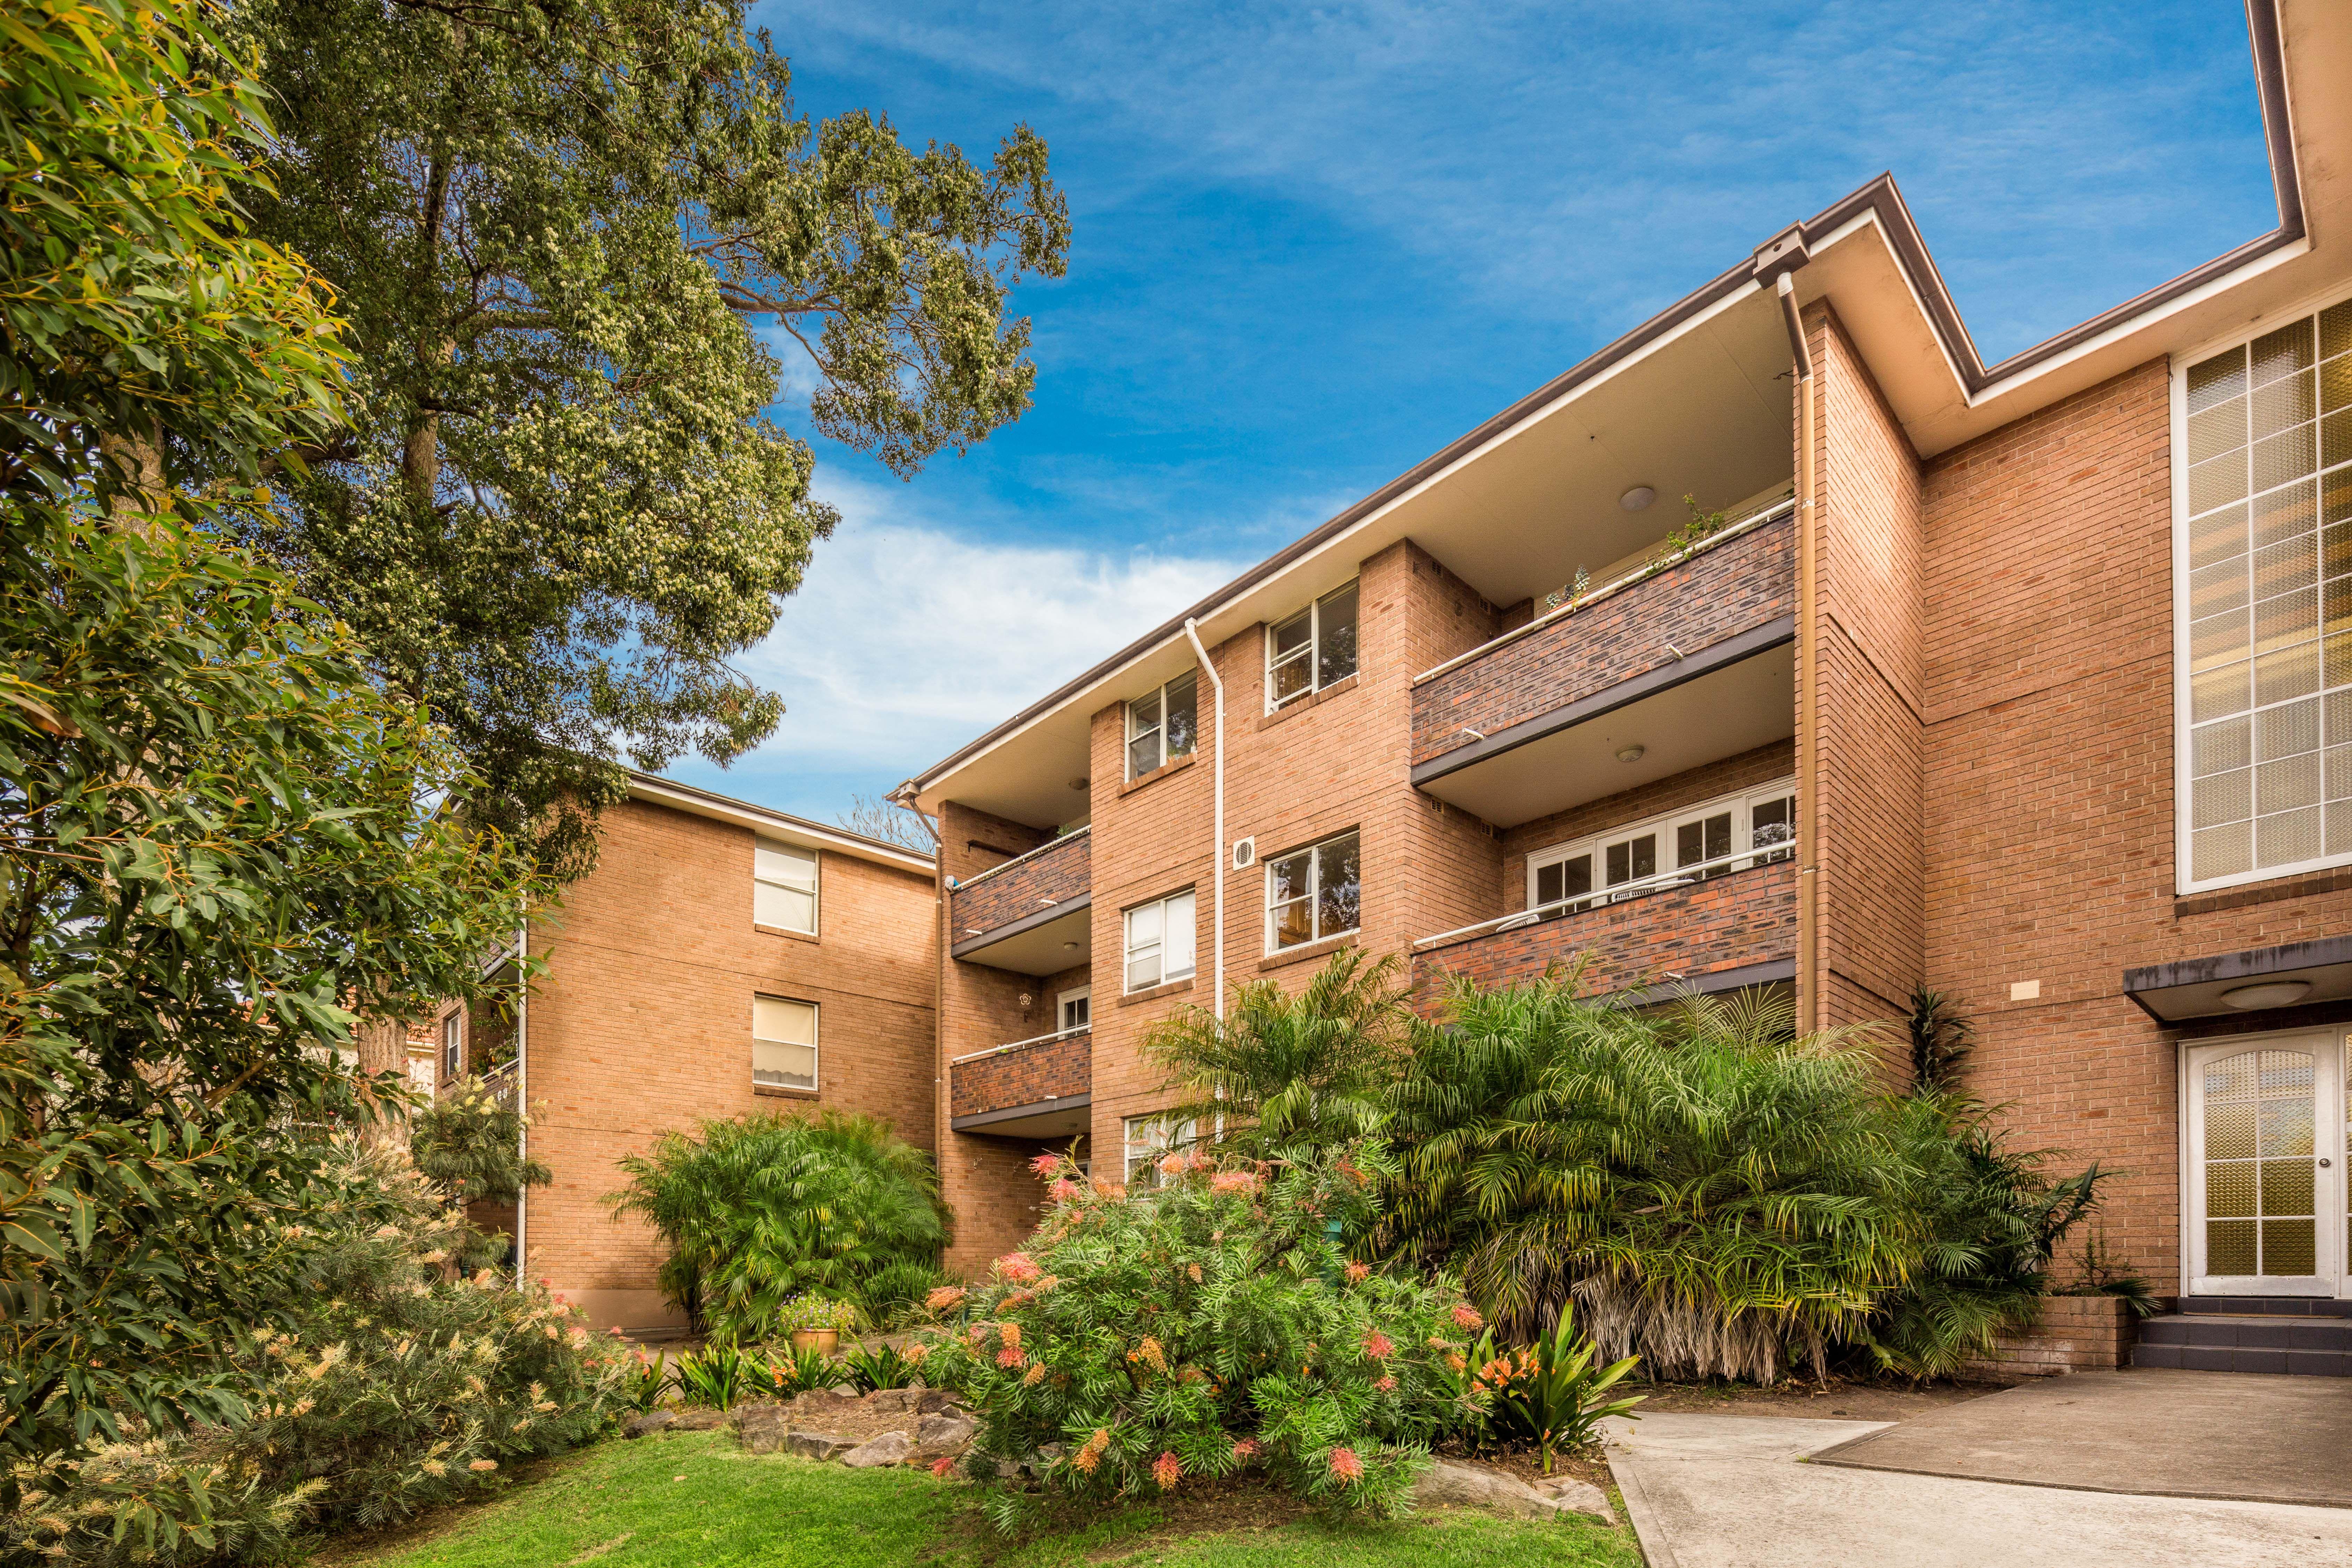 14/6-8 Gower Street, Summer Hill NSW 2130